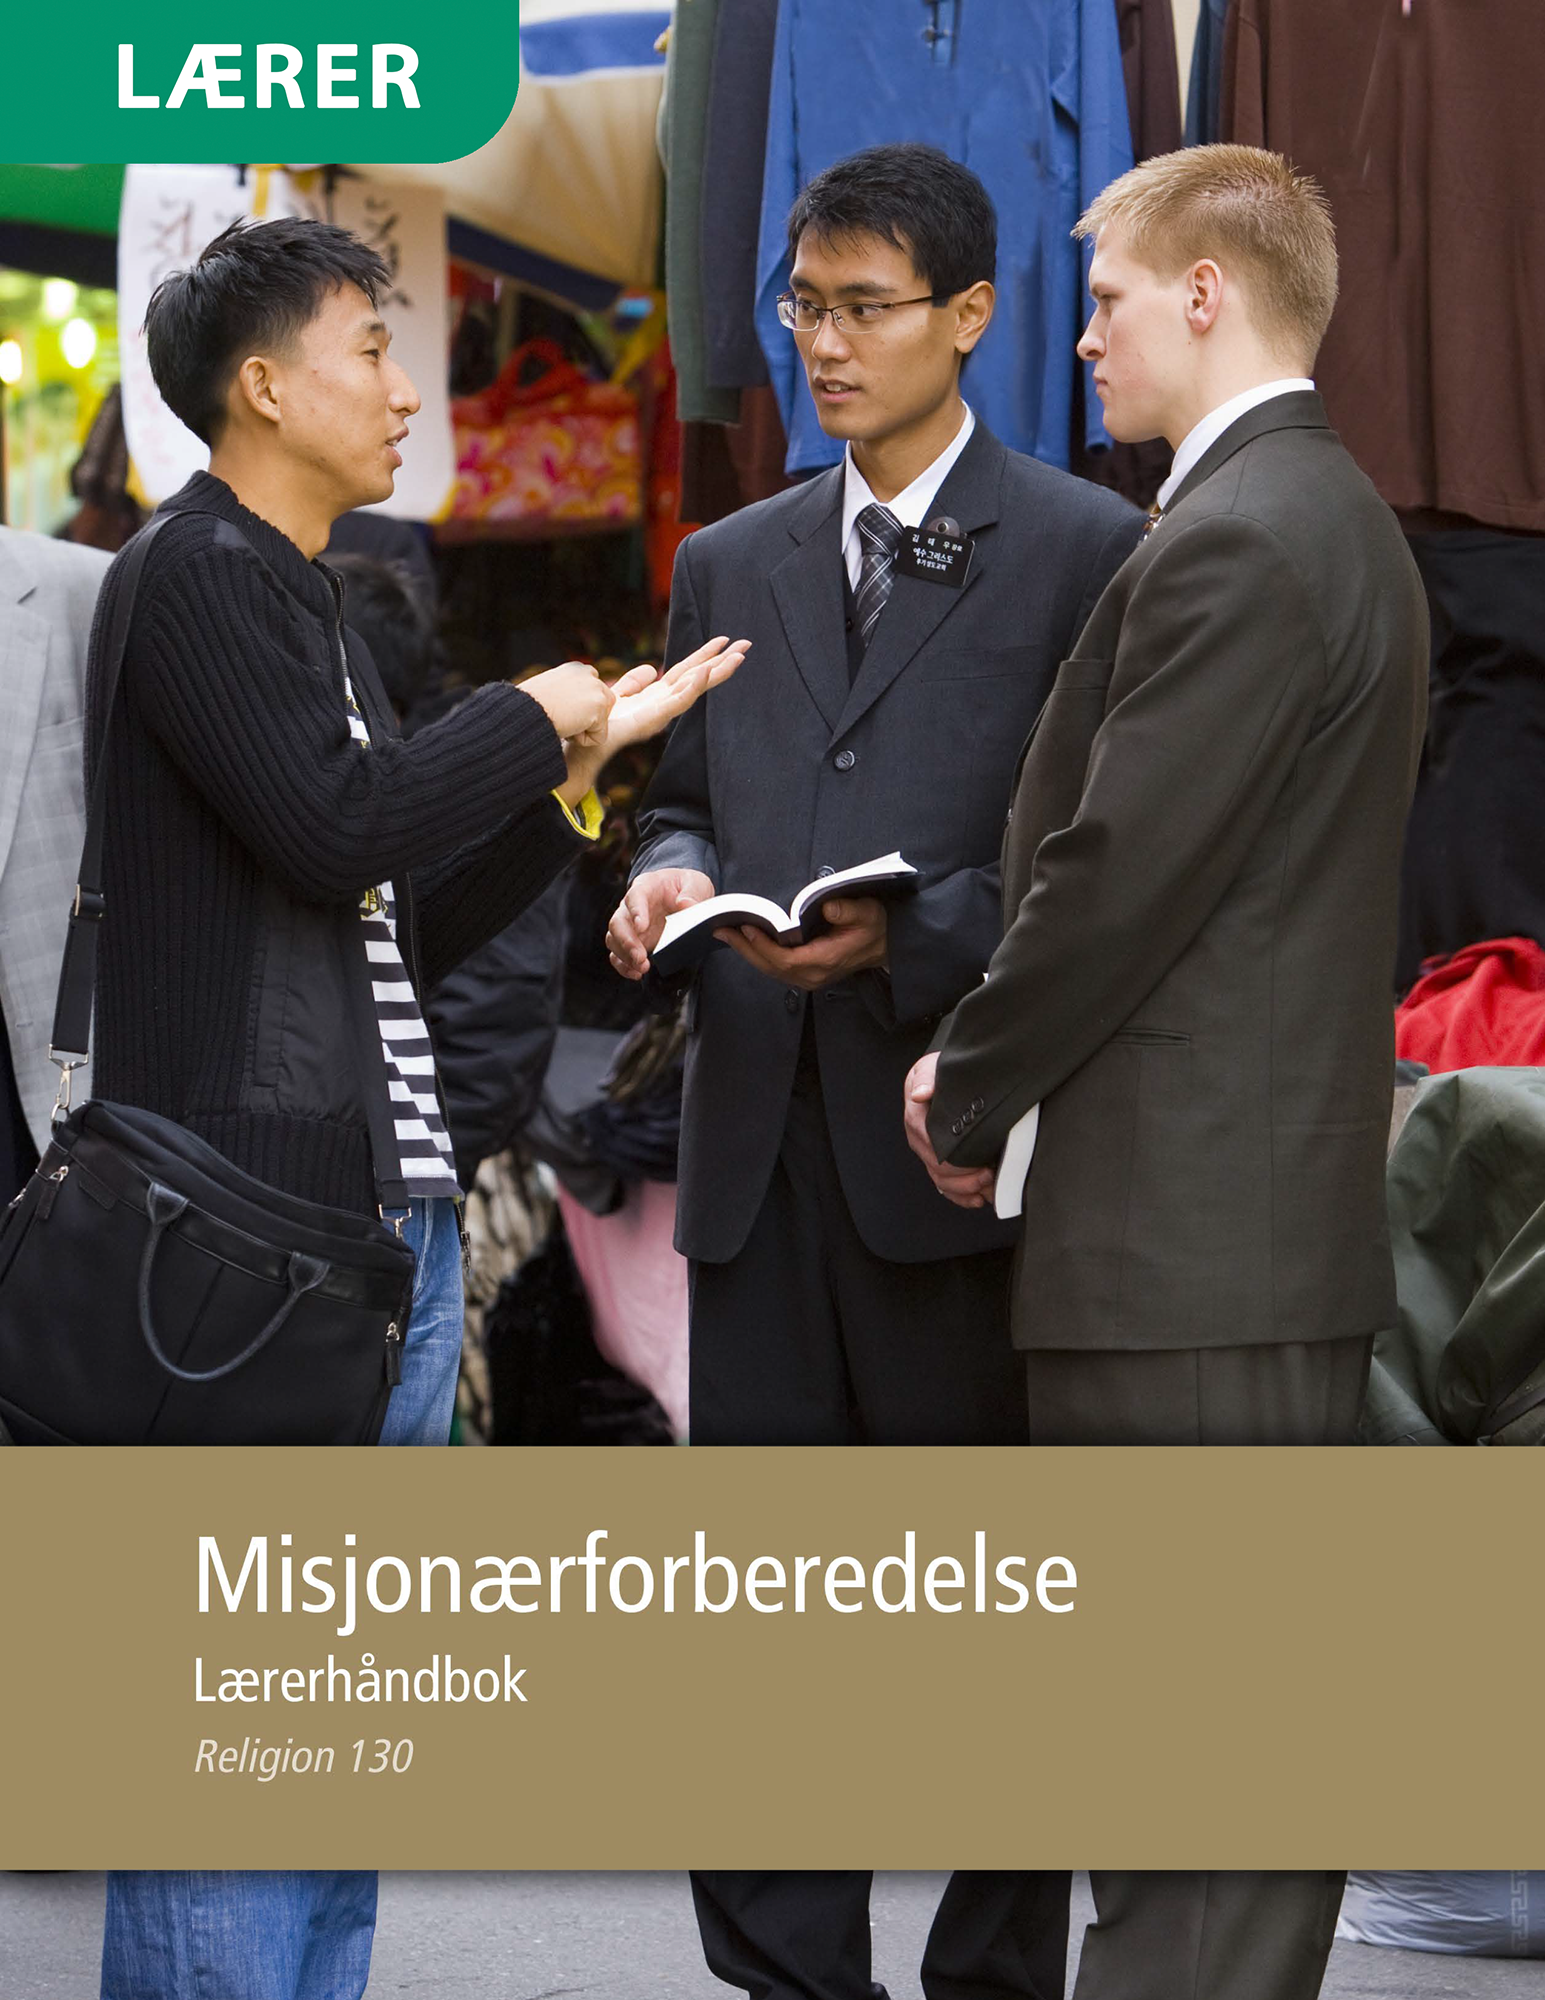 Misjonærforberedelse – Lærerhåndbok (Religion 130)